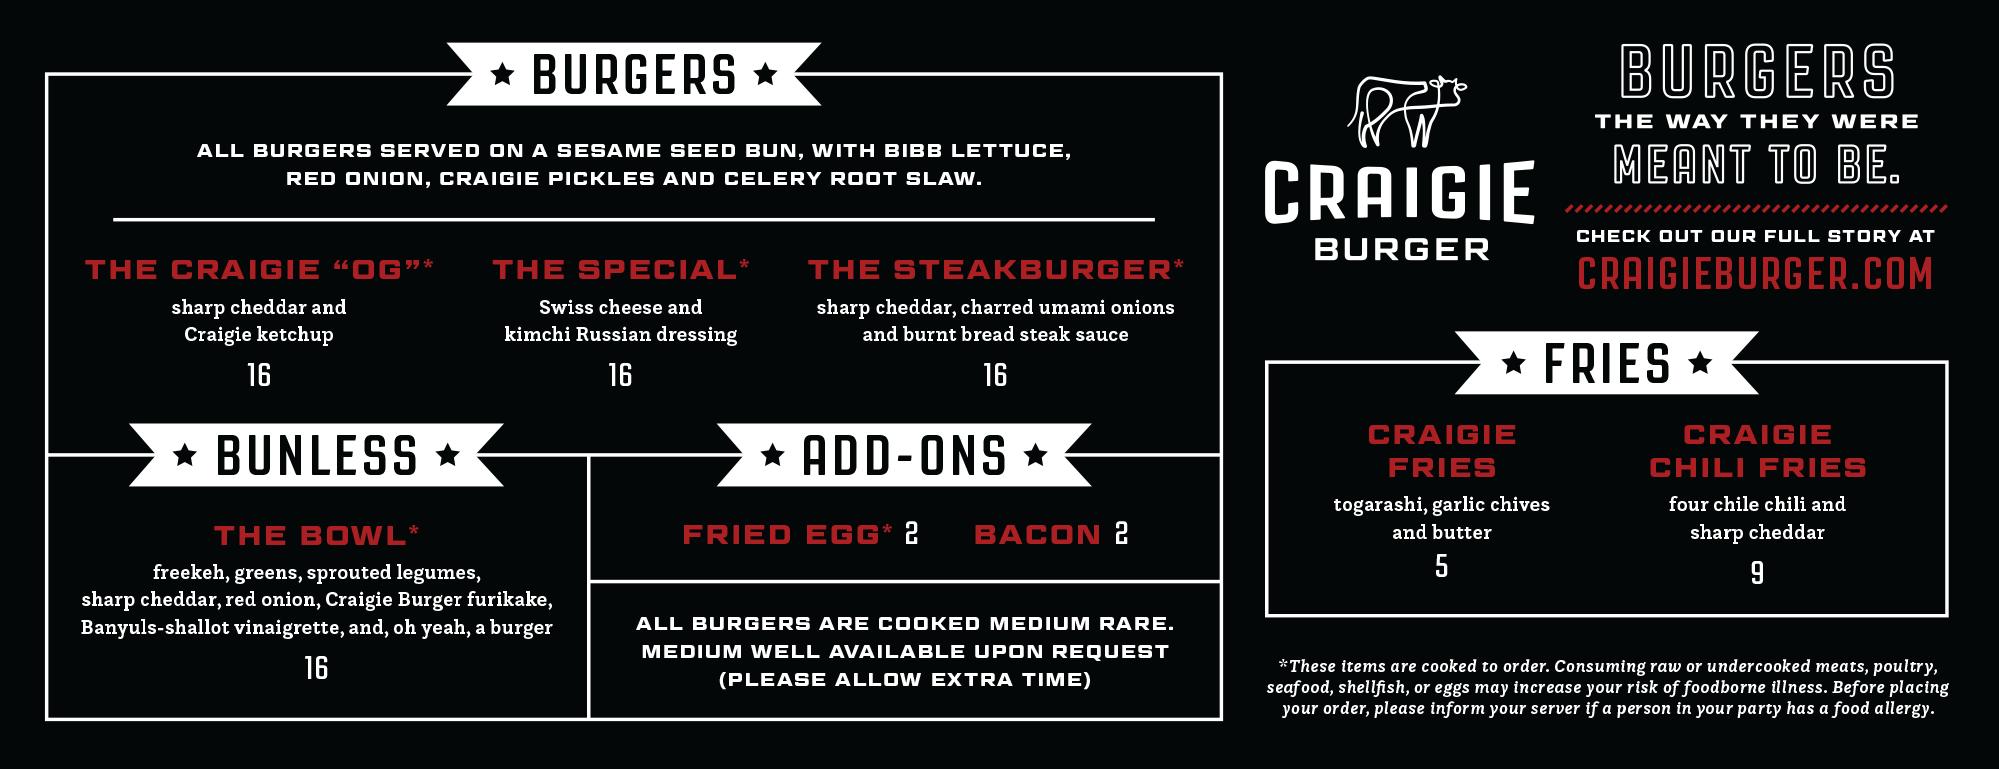 Craigie Burger Menu Board.png